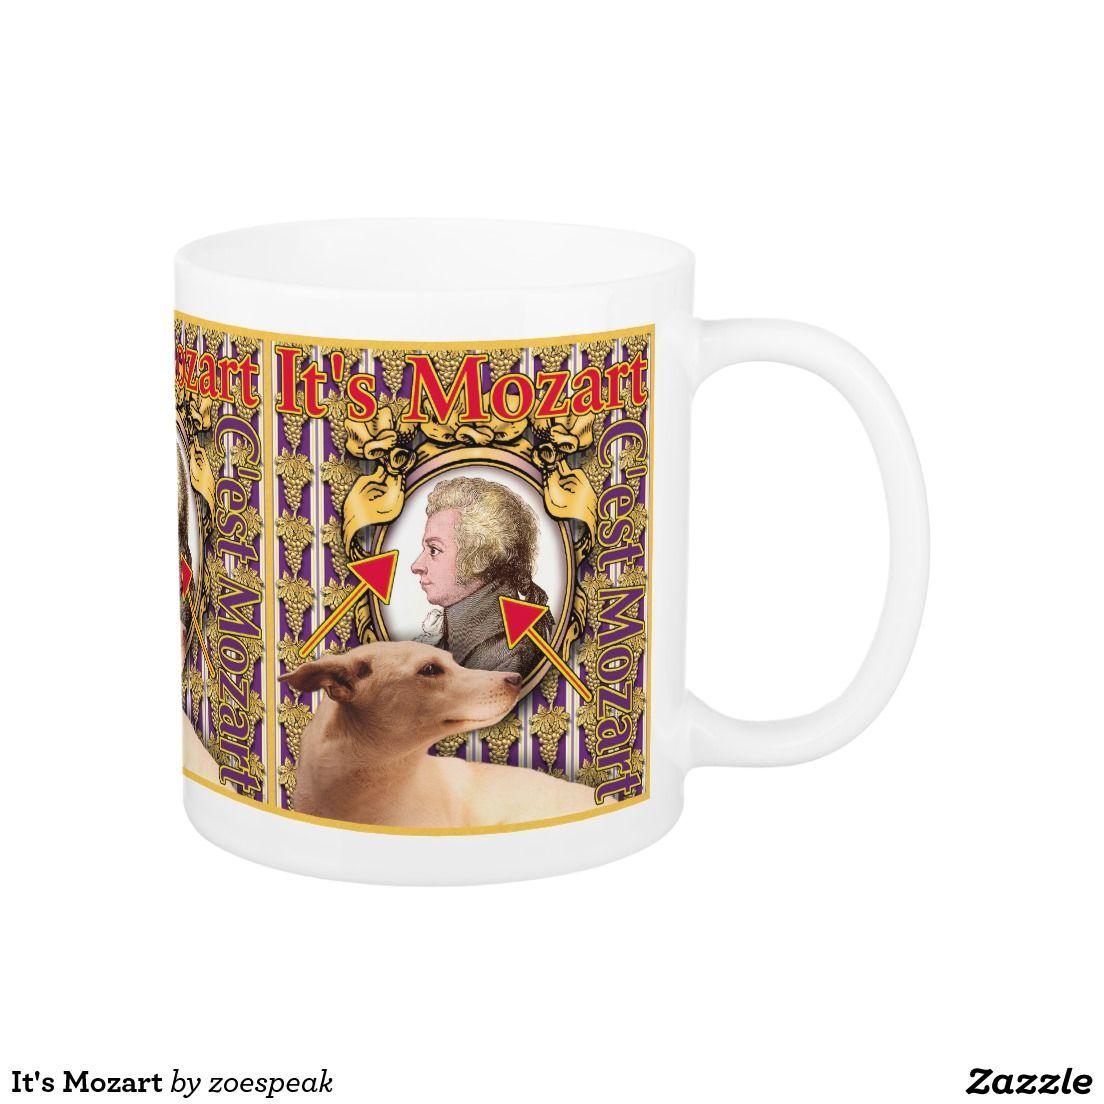 It's Mozart Coffee Mug from ZoeSPEAK